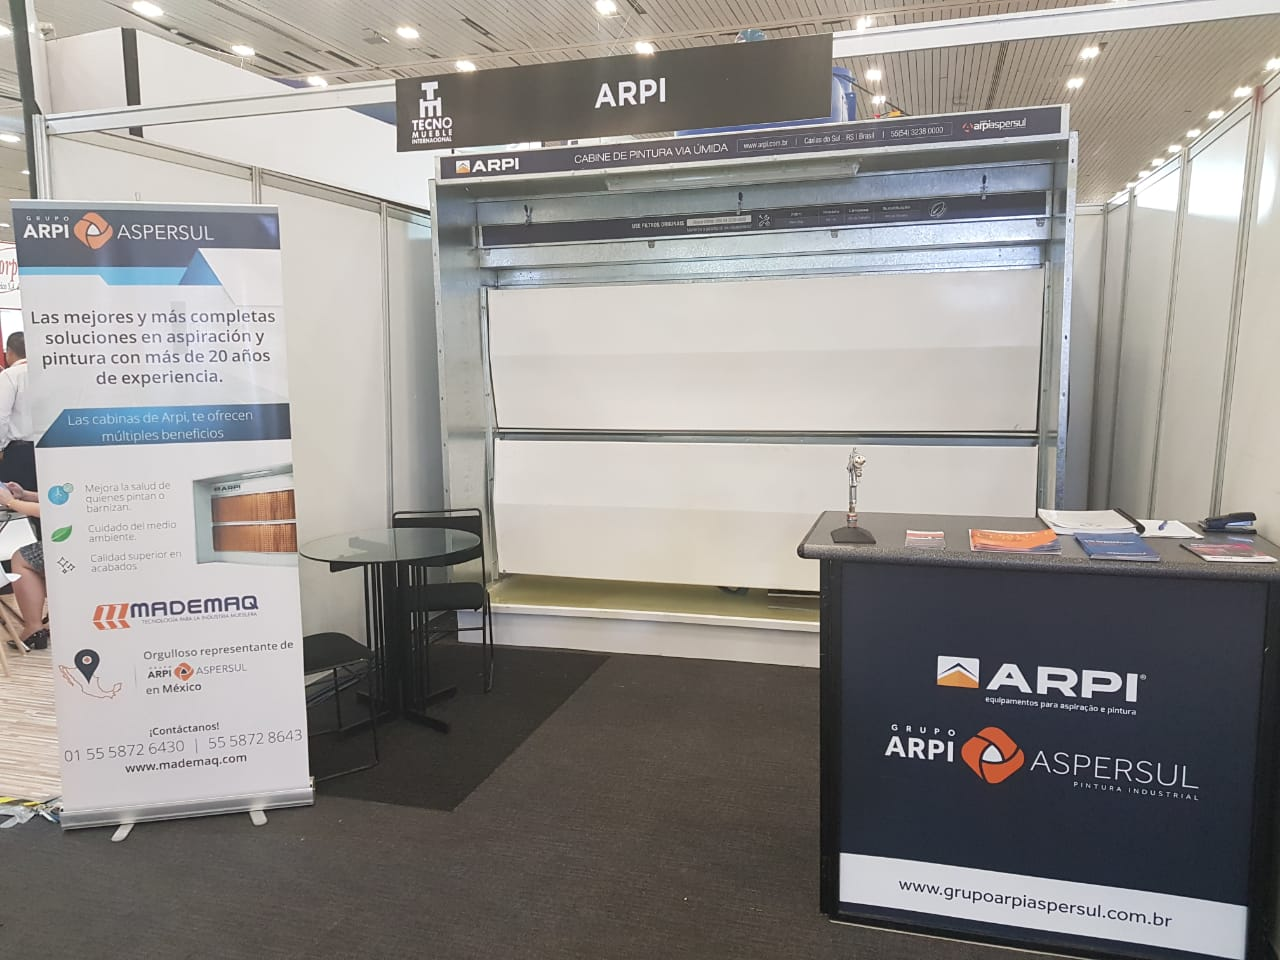 Grupo ArpiAspersul apresenta tecnologias inovadoras para o mercado moveleiro no México